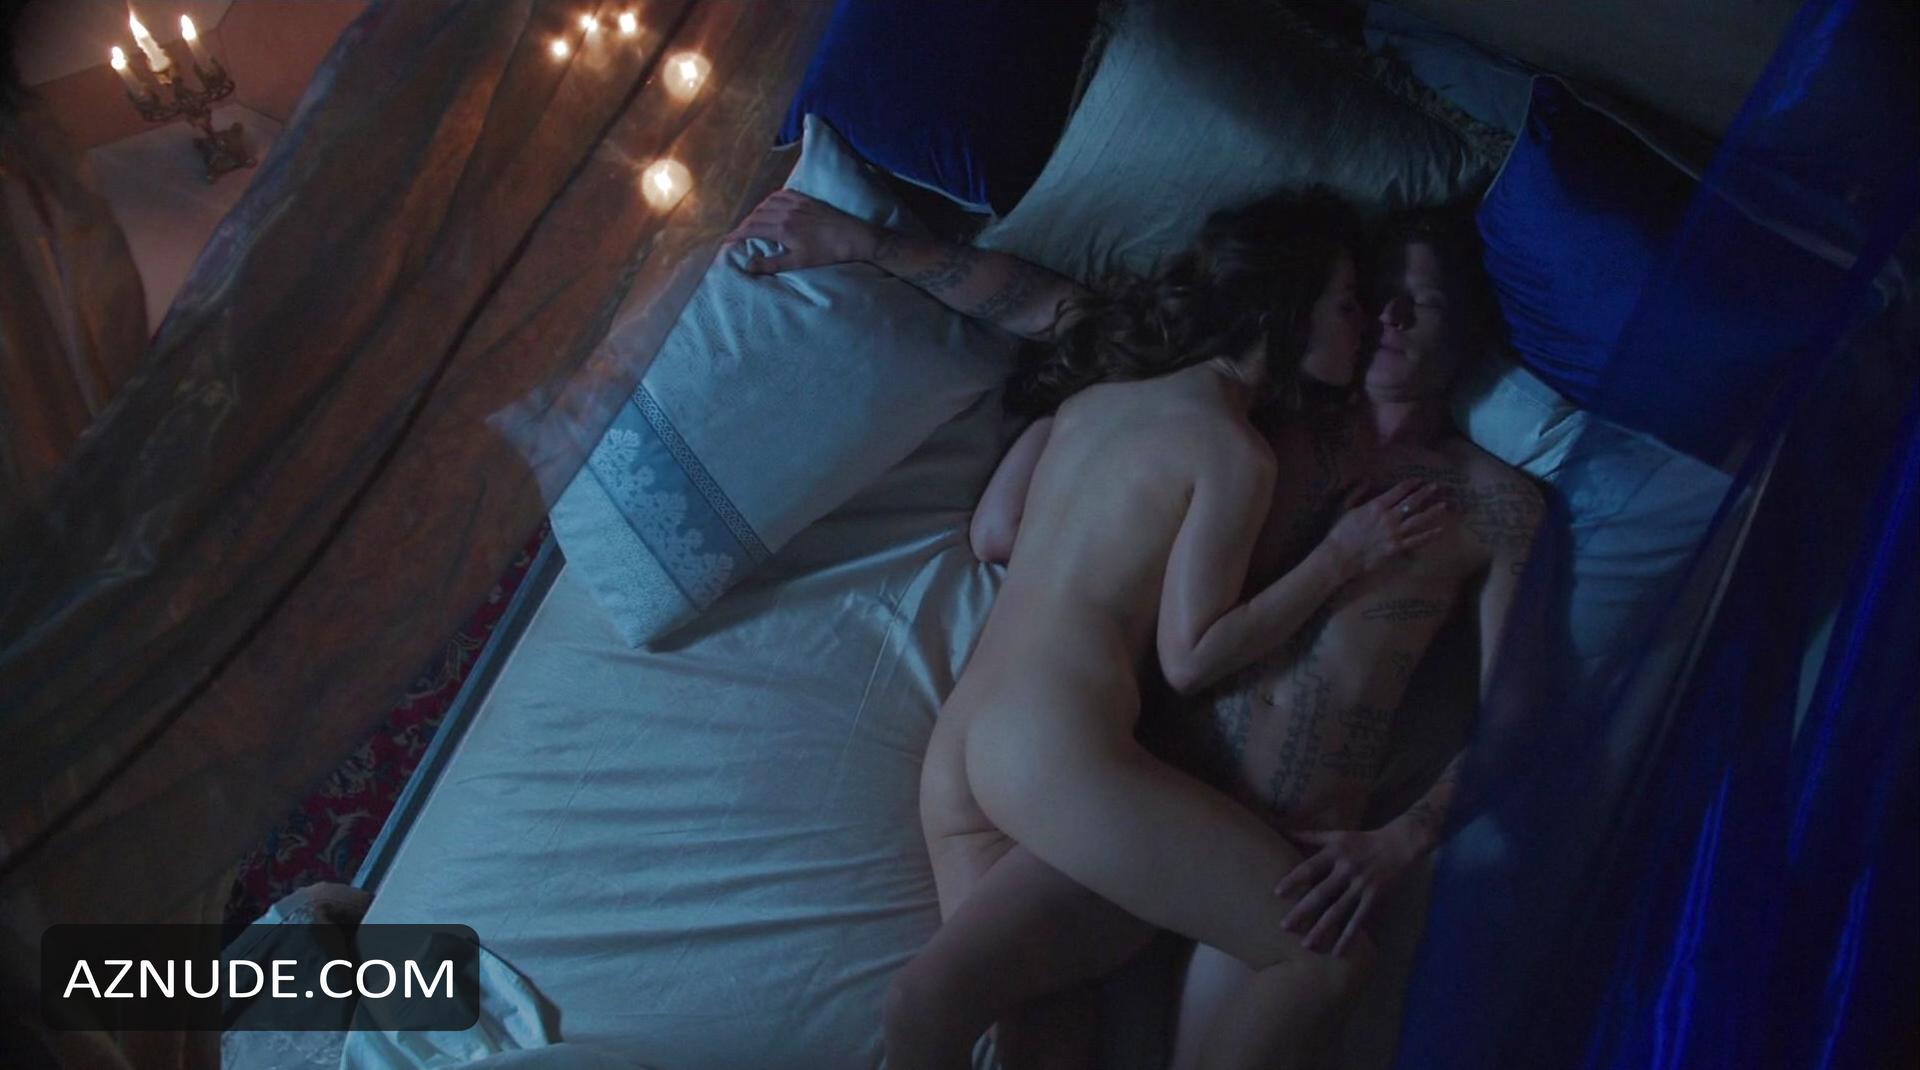 Lucy liu sex tape real hidden cam las vegas hotel room - 3 6